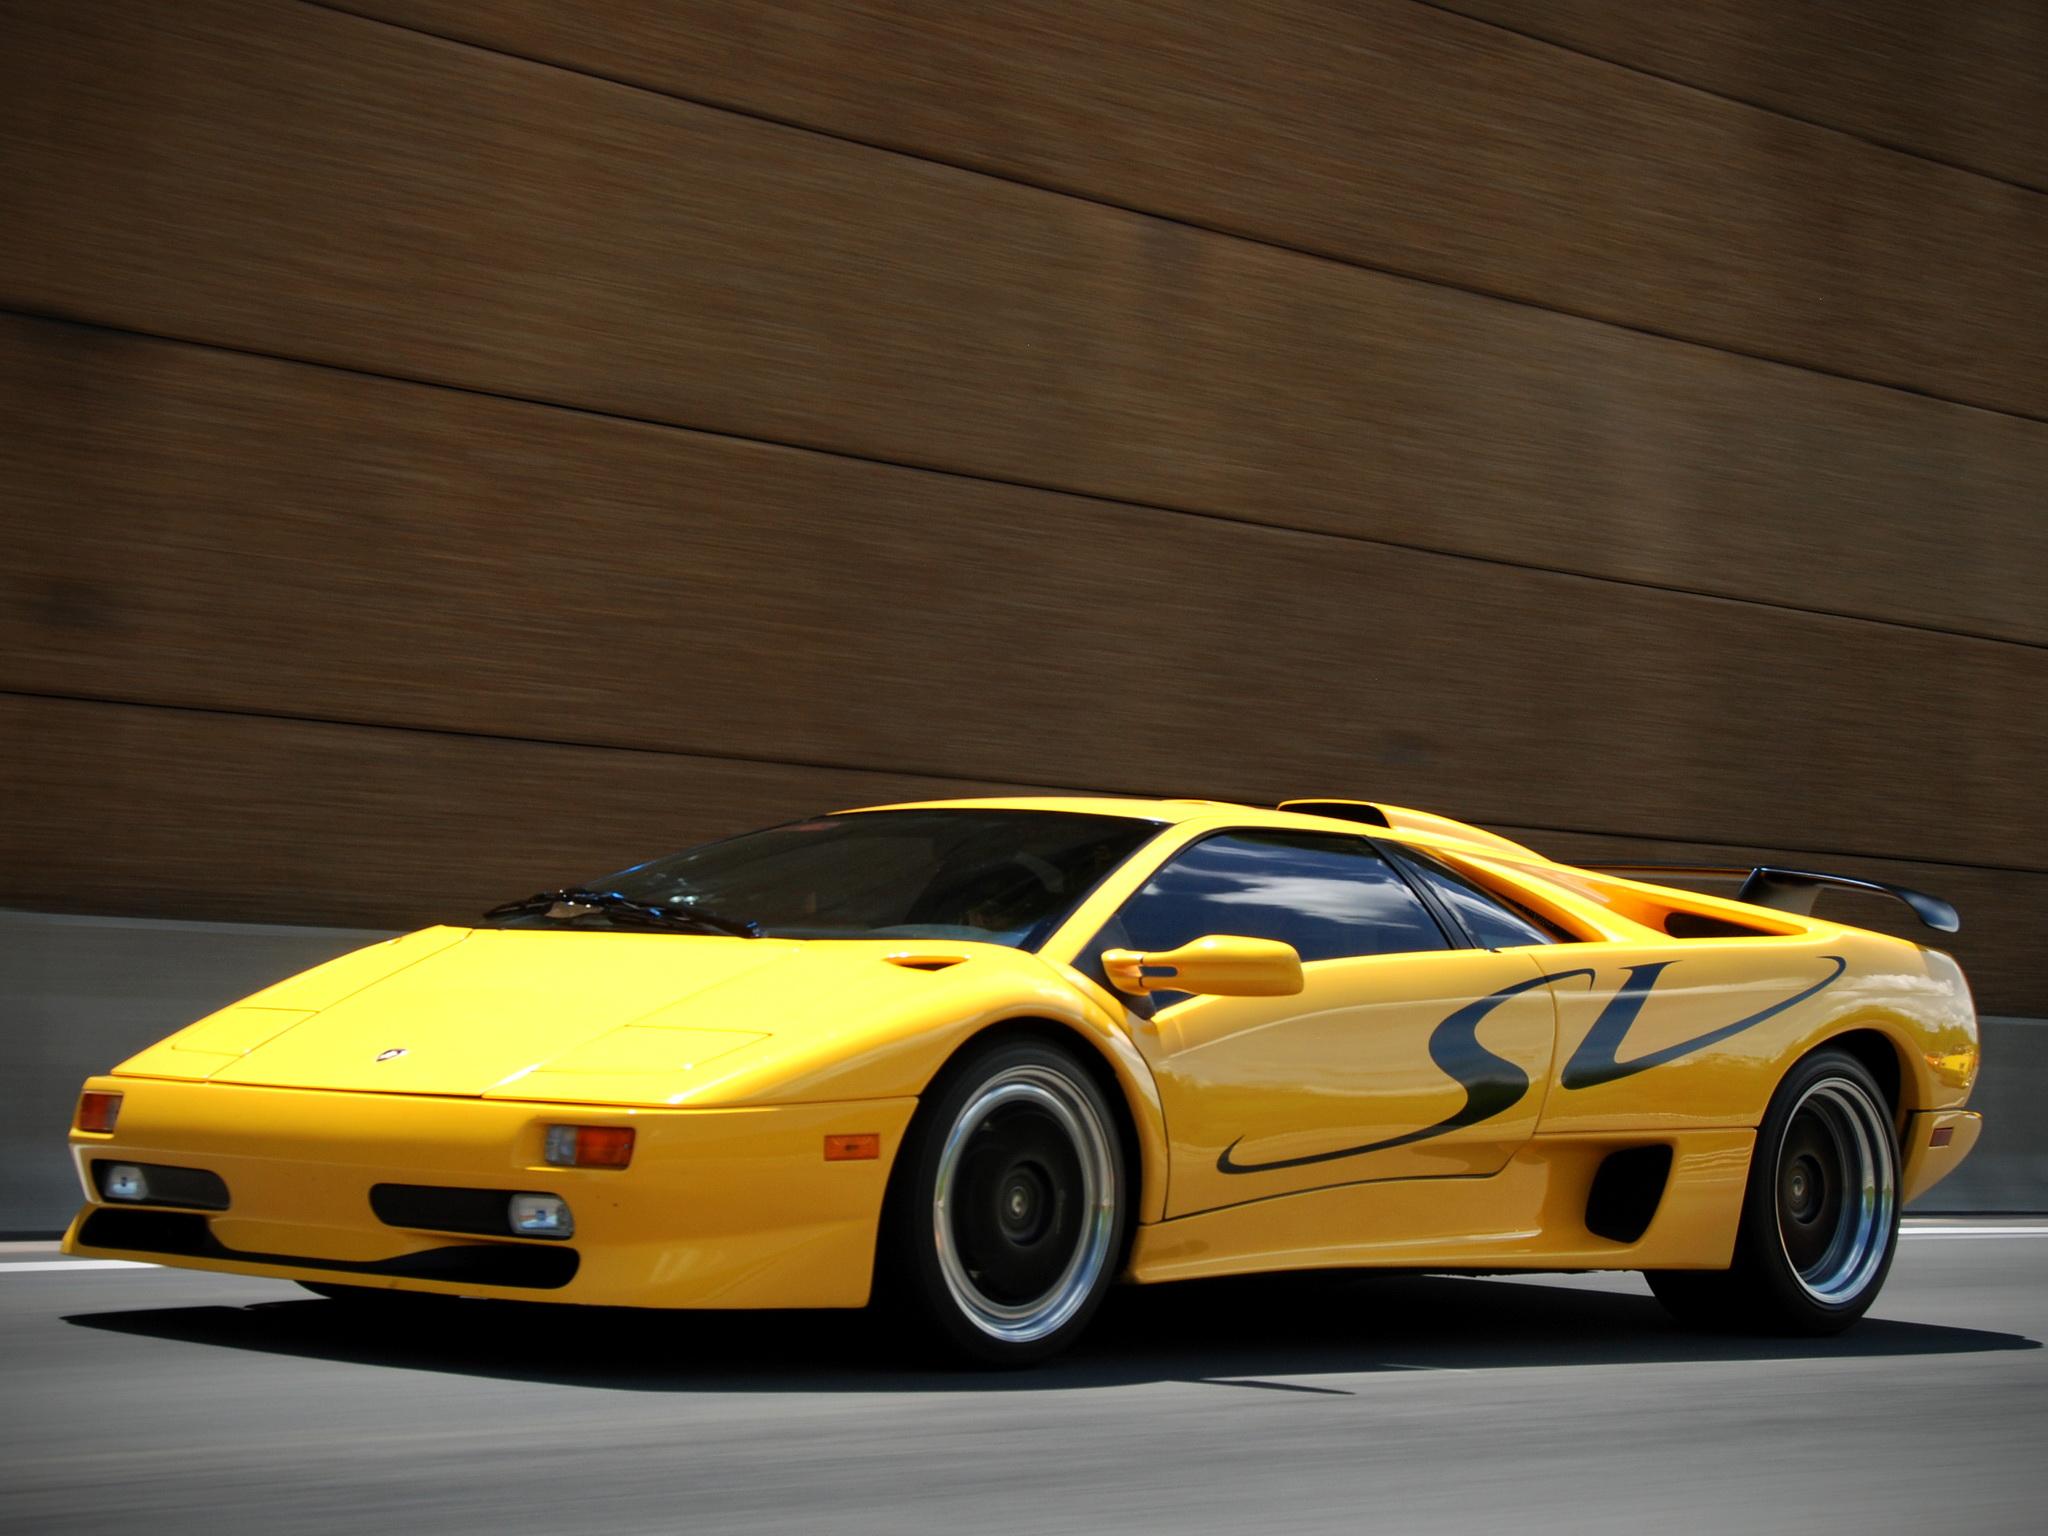 1995 Lamborghini Miura Partsopen 1997 Infinity Eagle Mini Right Fuse Box Diagram Src